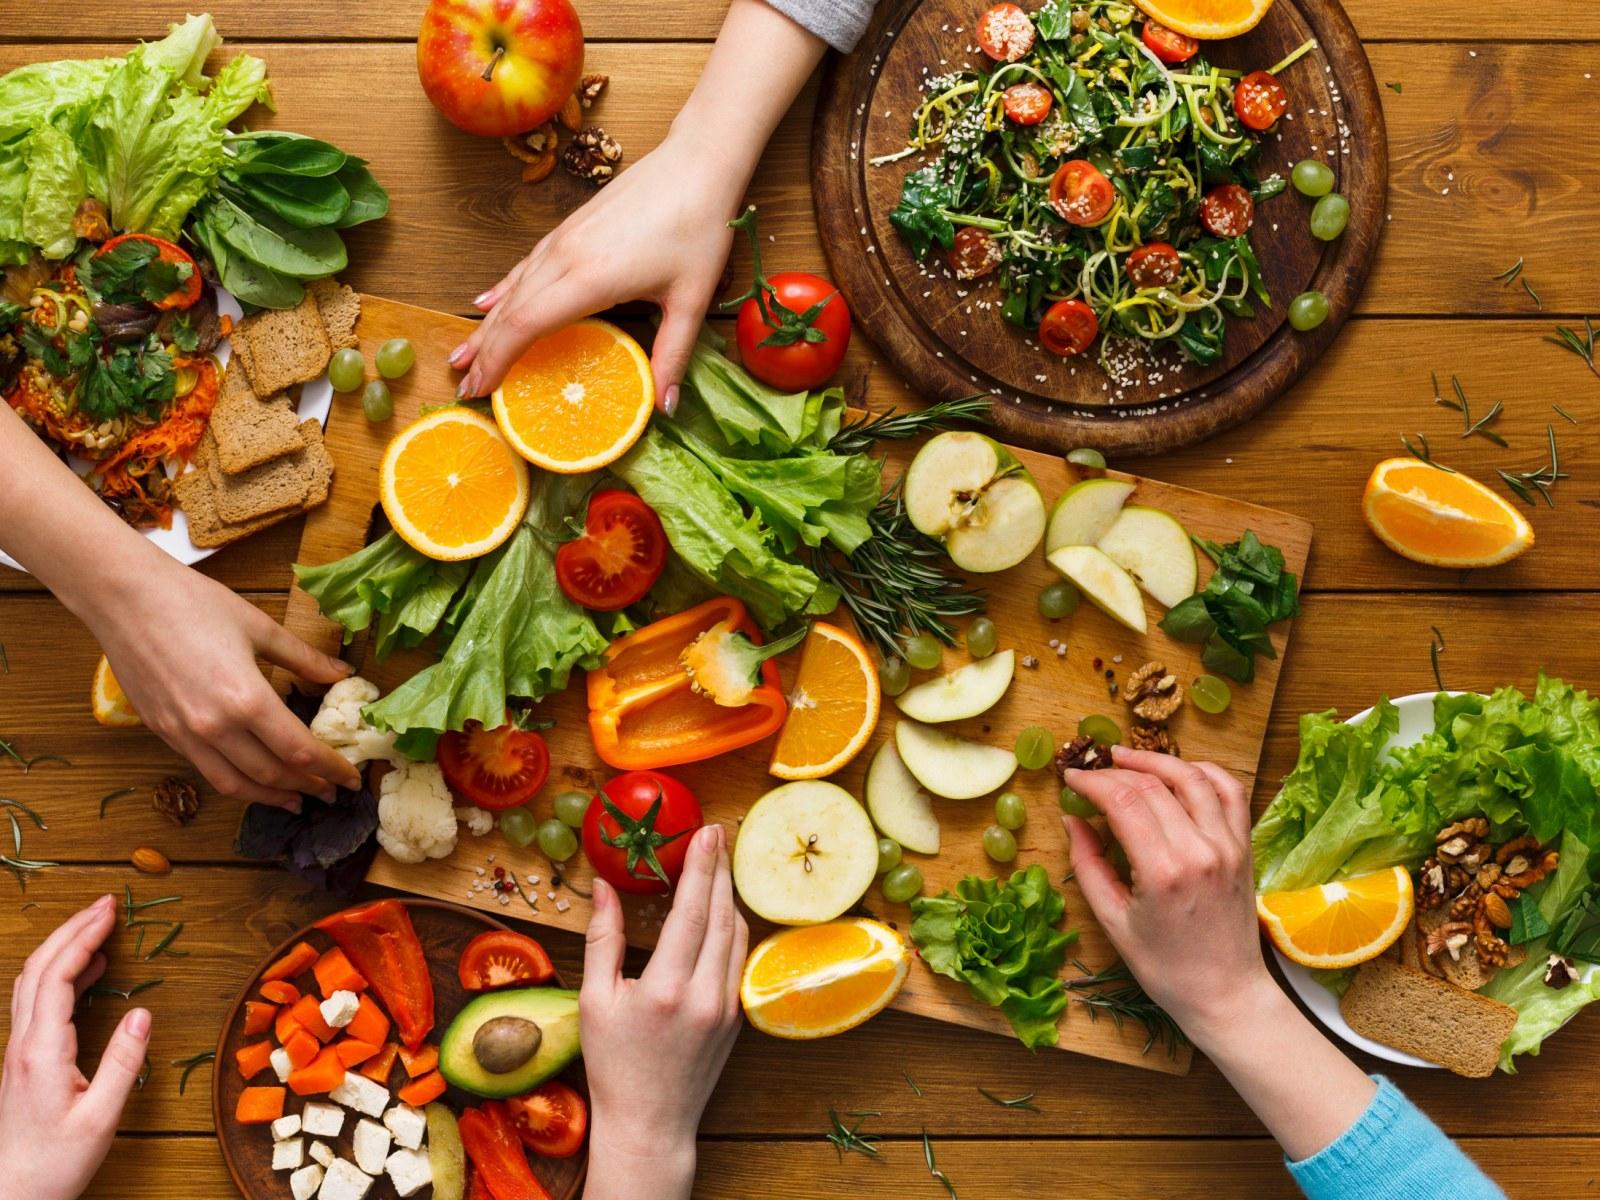 a low carb diet plan